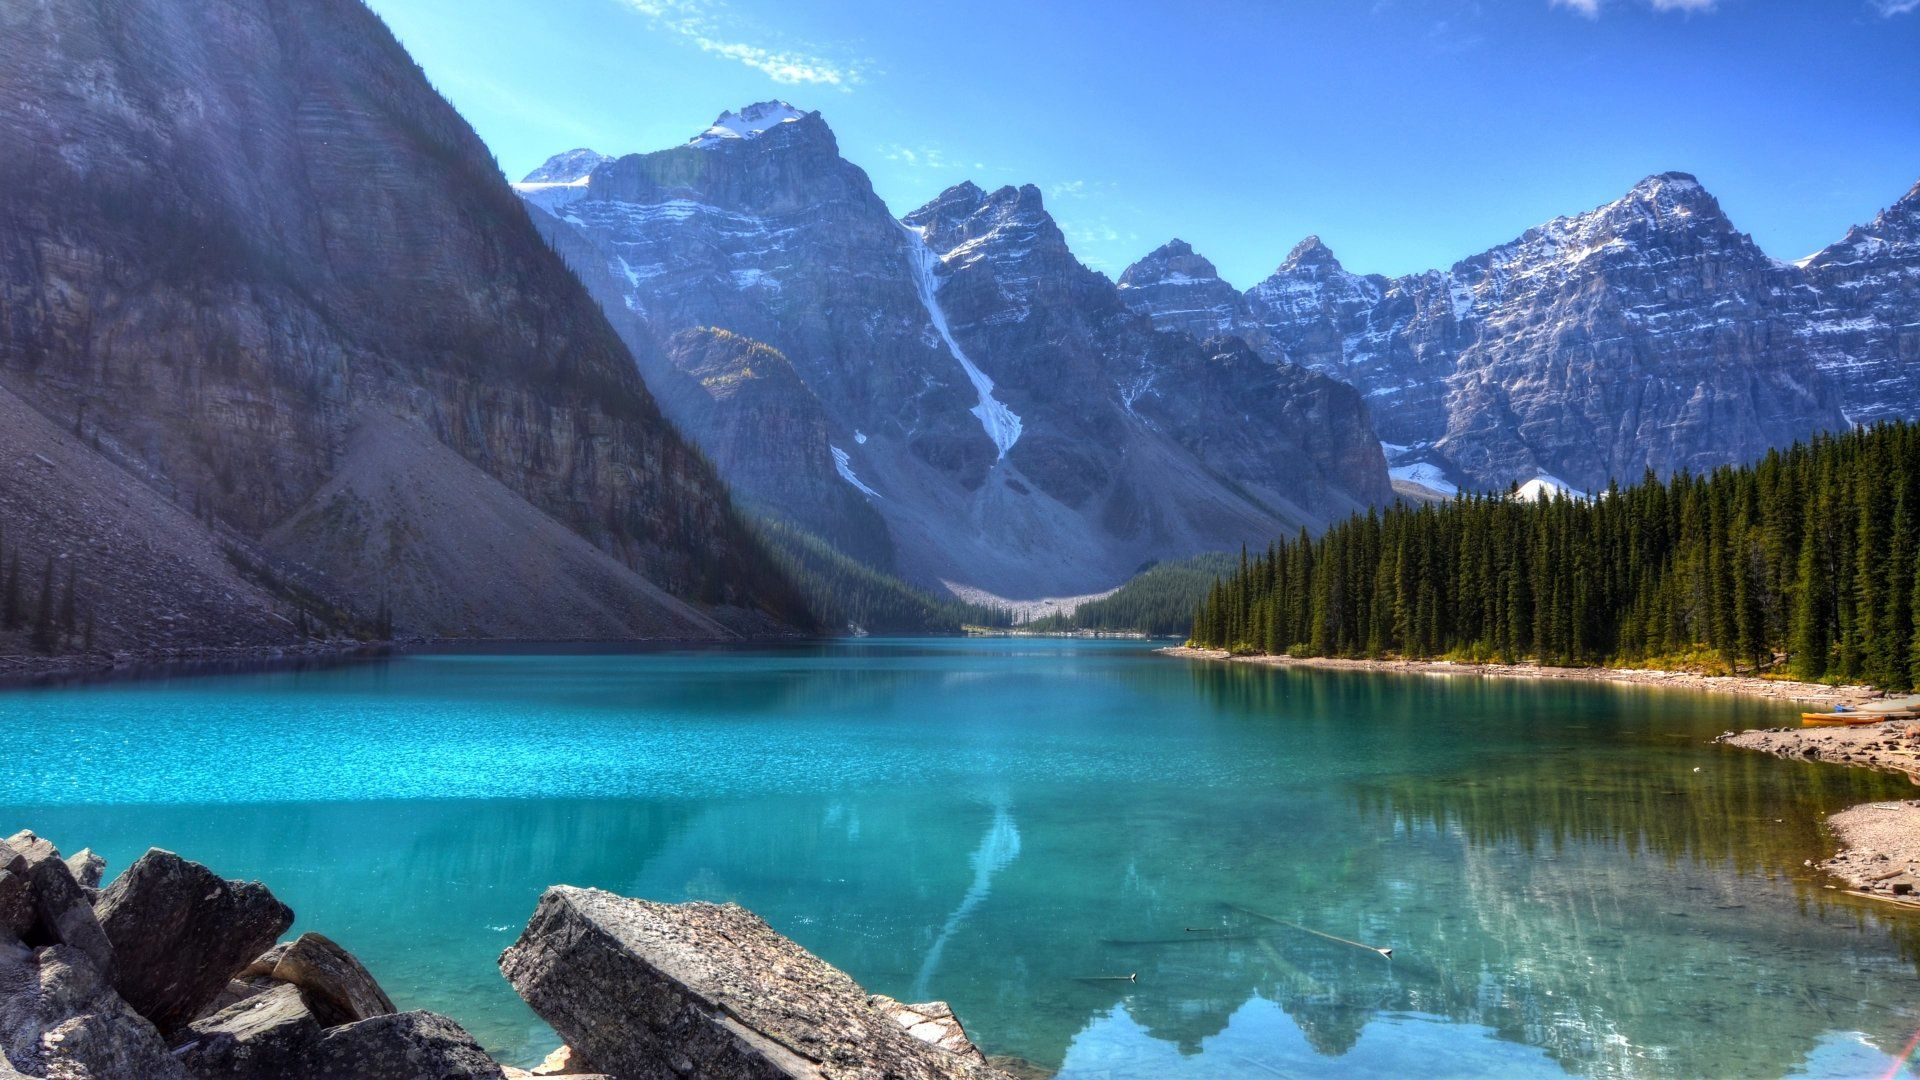 Earth Moraine Lake Banff National Park Alberta Canada Canadian Rockies Lake Mountain Reflection Clif Nature Desktop Hd Nature Wallpapers 4k Desktop Wallpapers